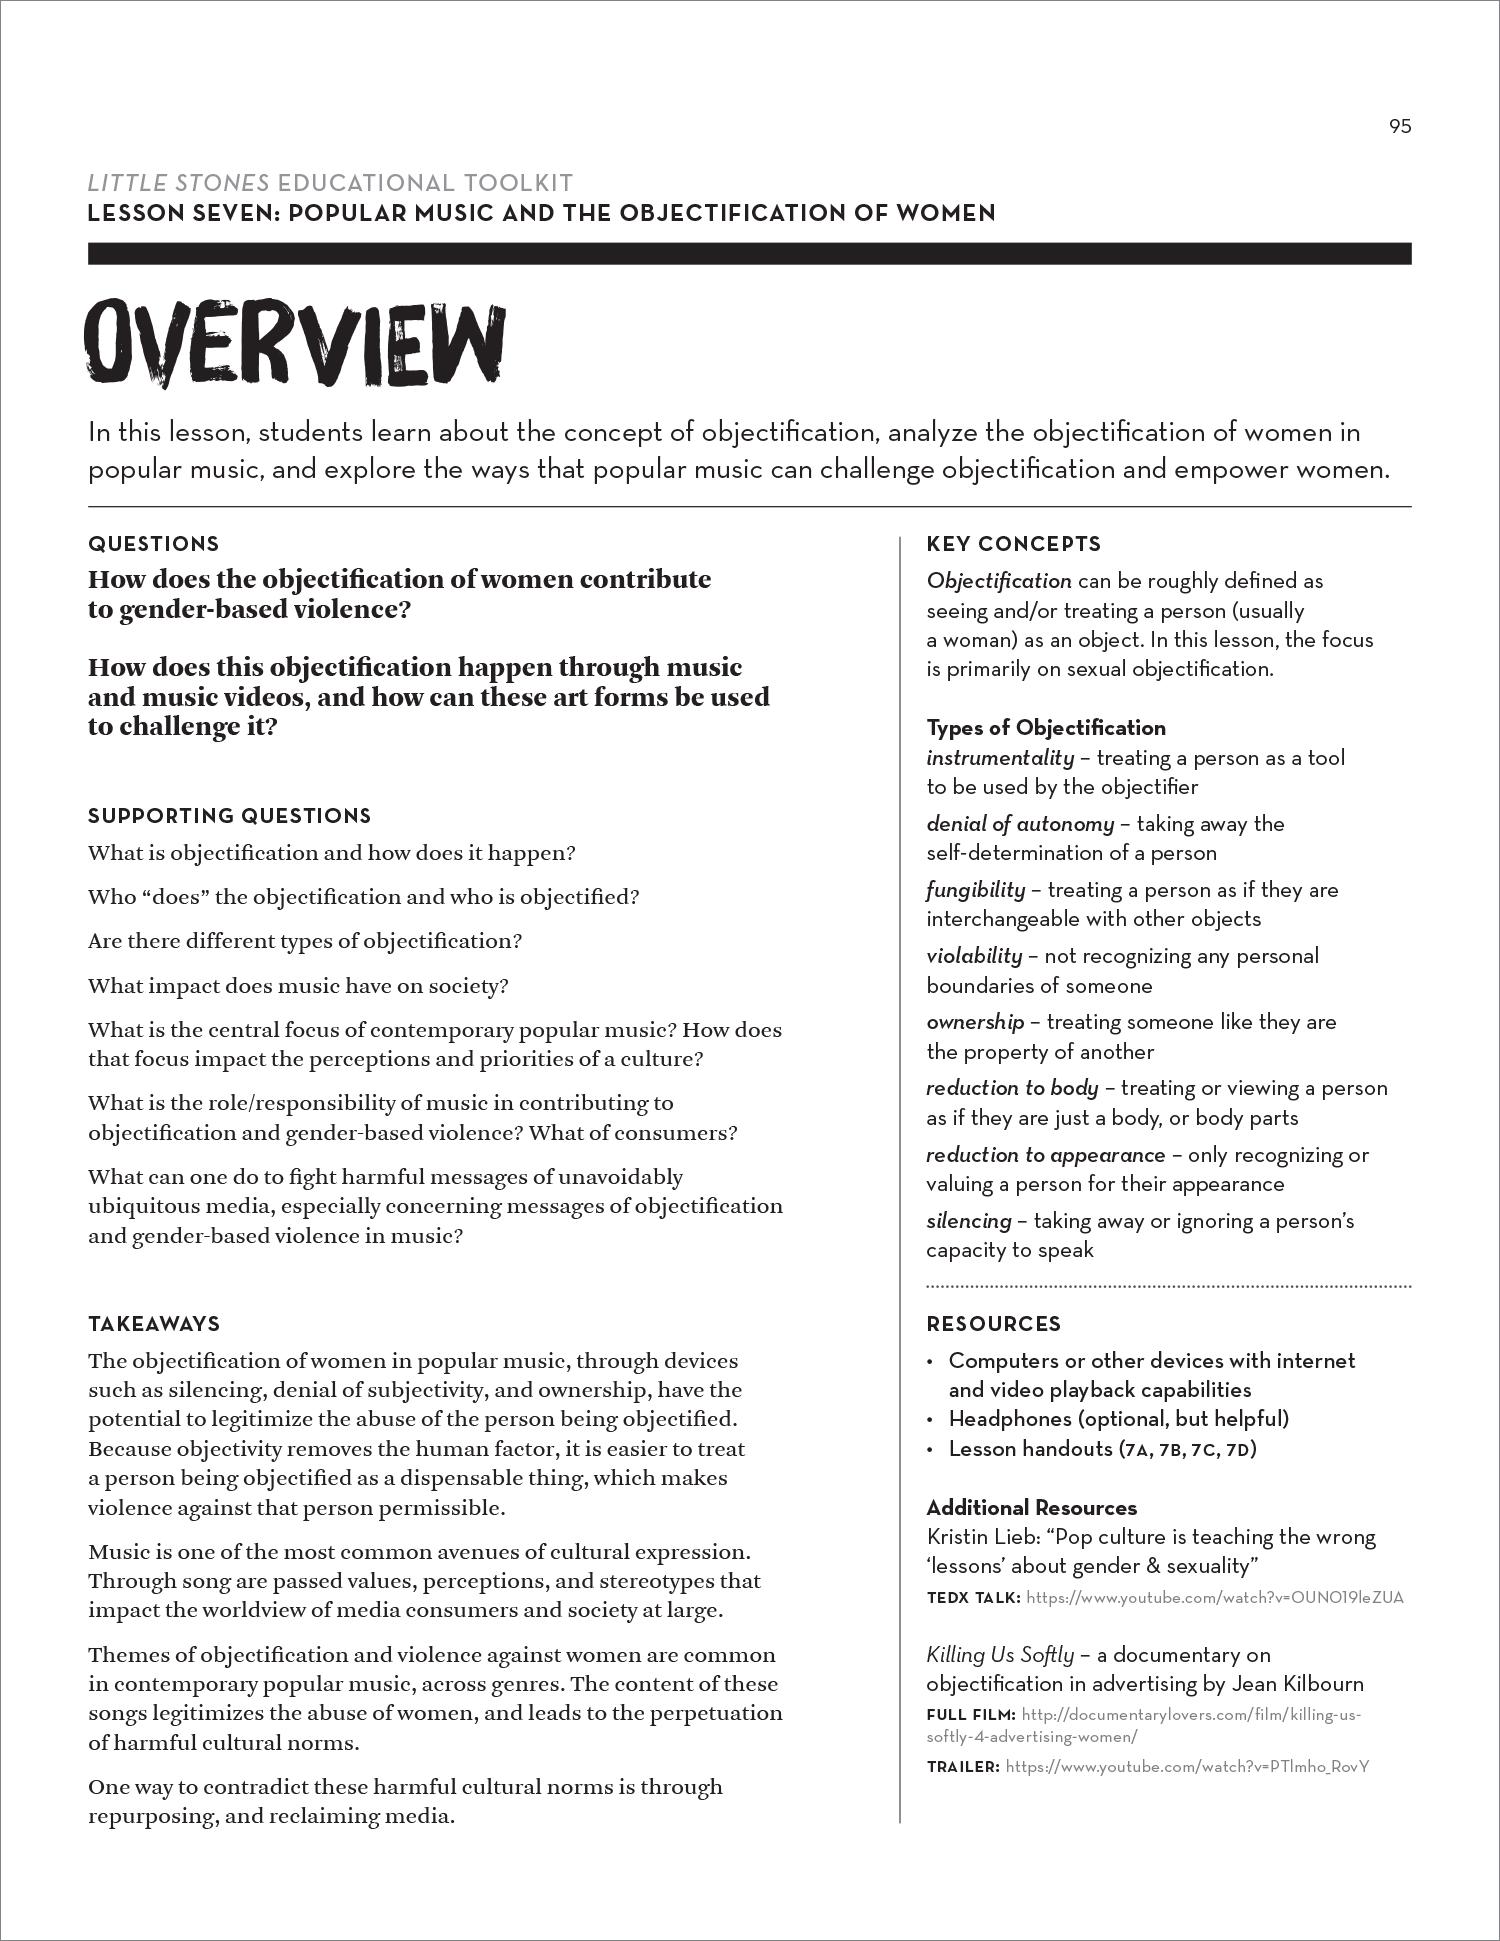 littlestones_toolkit-04.png